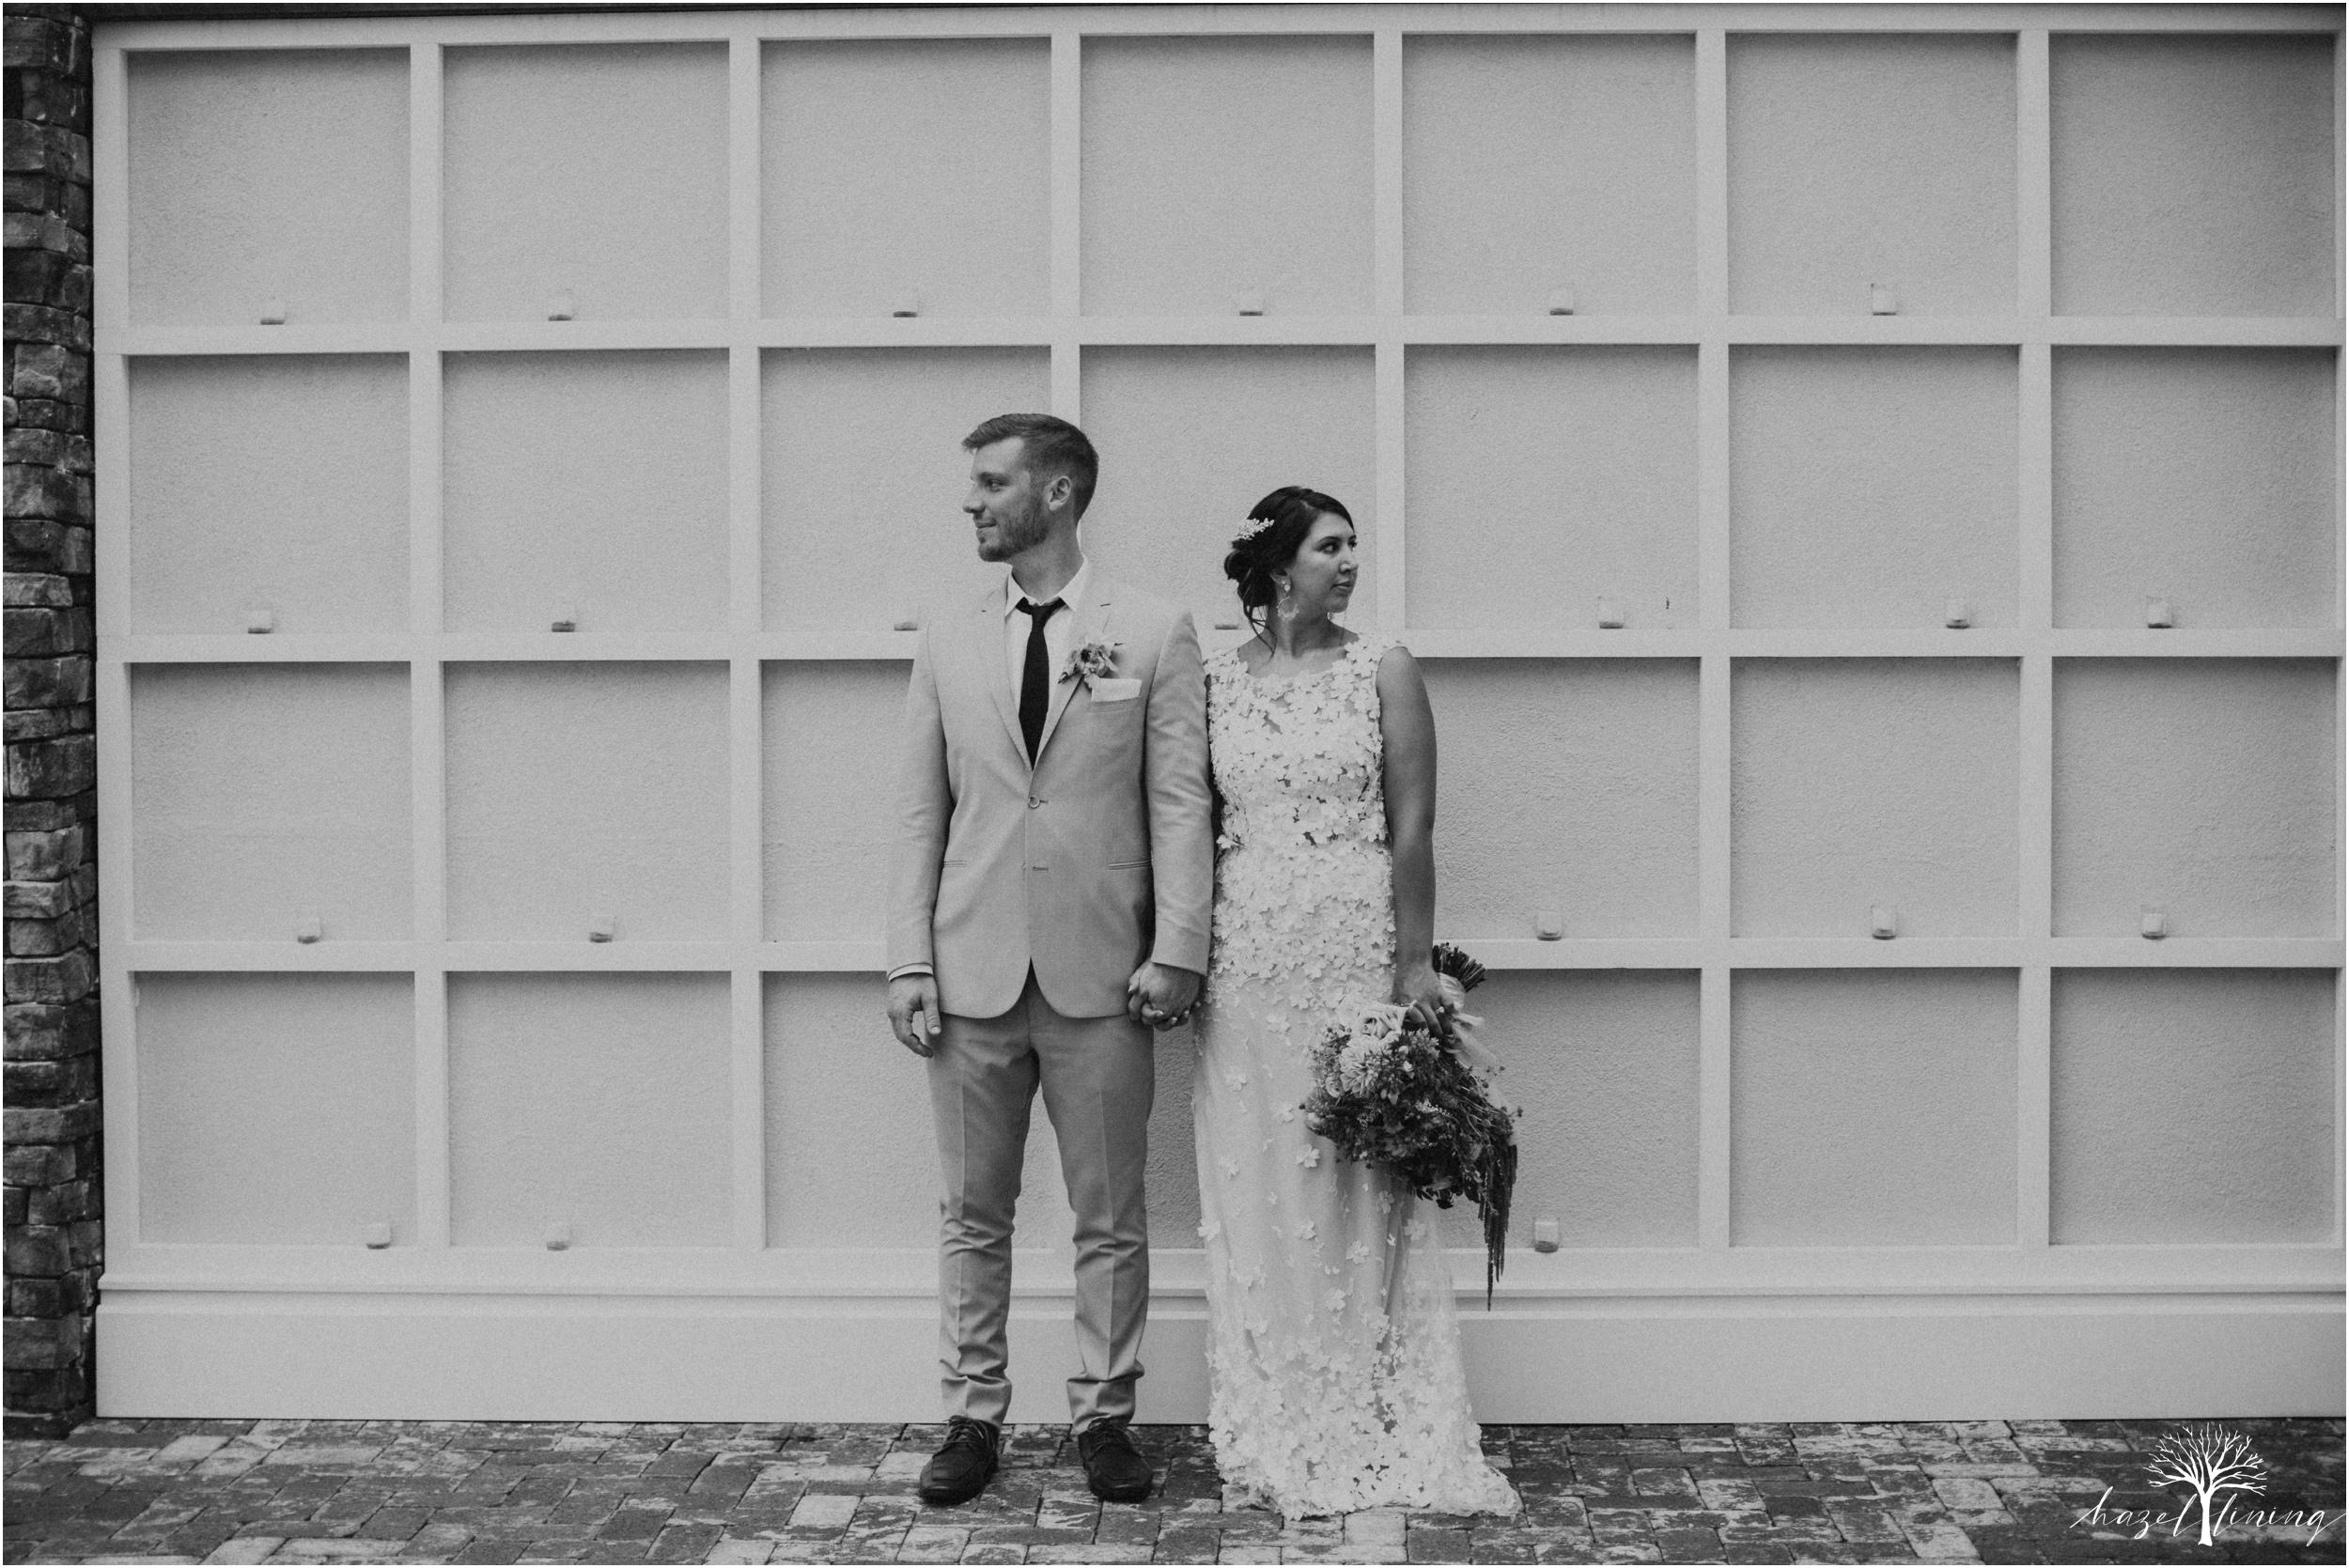 carl-chloe-the-ryland-inn-whitehouse-station-new-jersey-styled-squad-hazel-lining-photography-destination-elopement-wedding-engagement-photography_0031.jpg